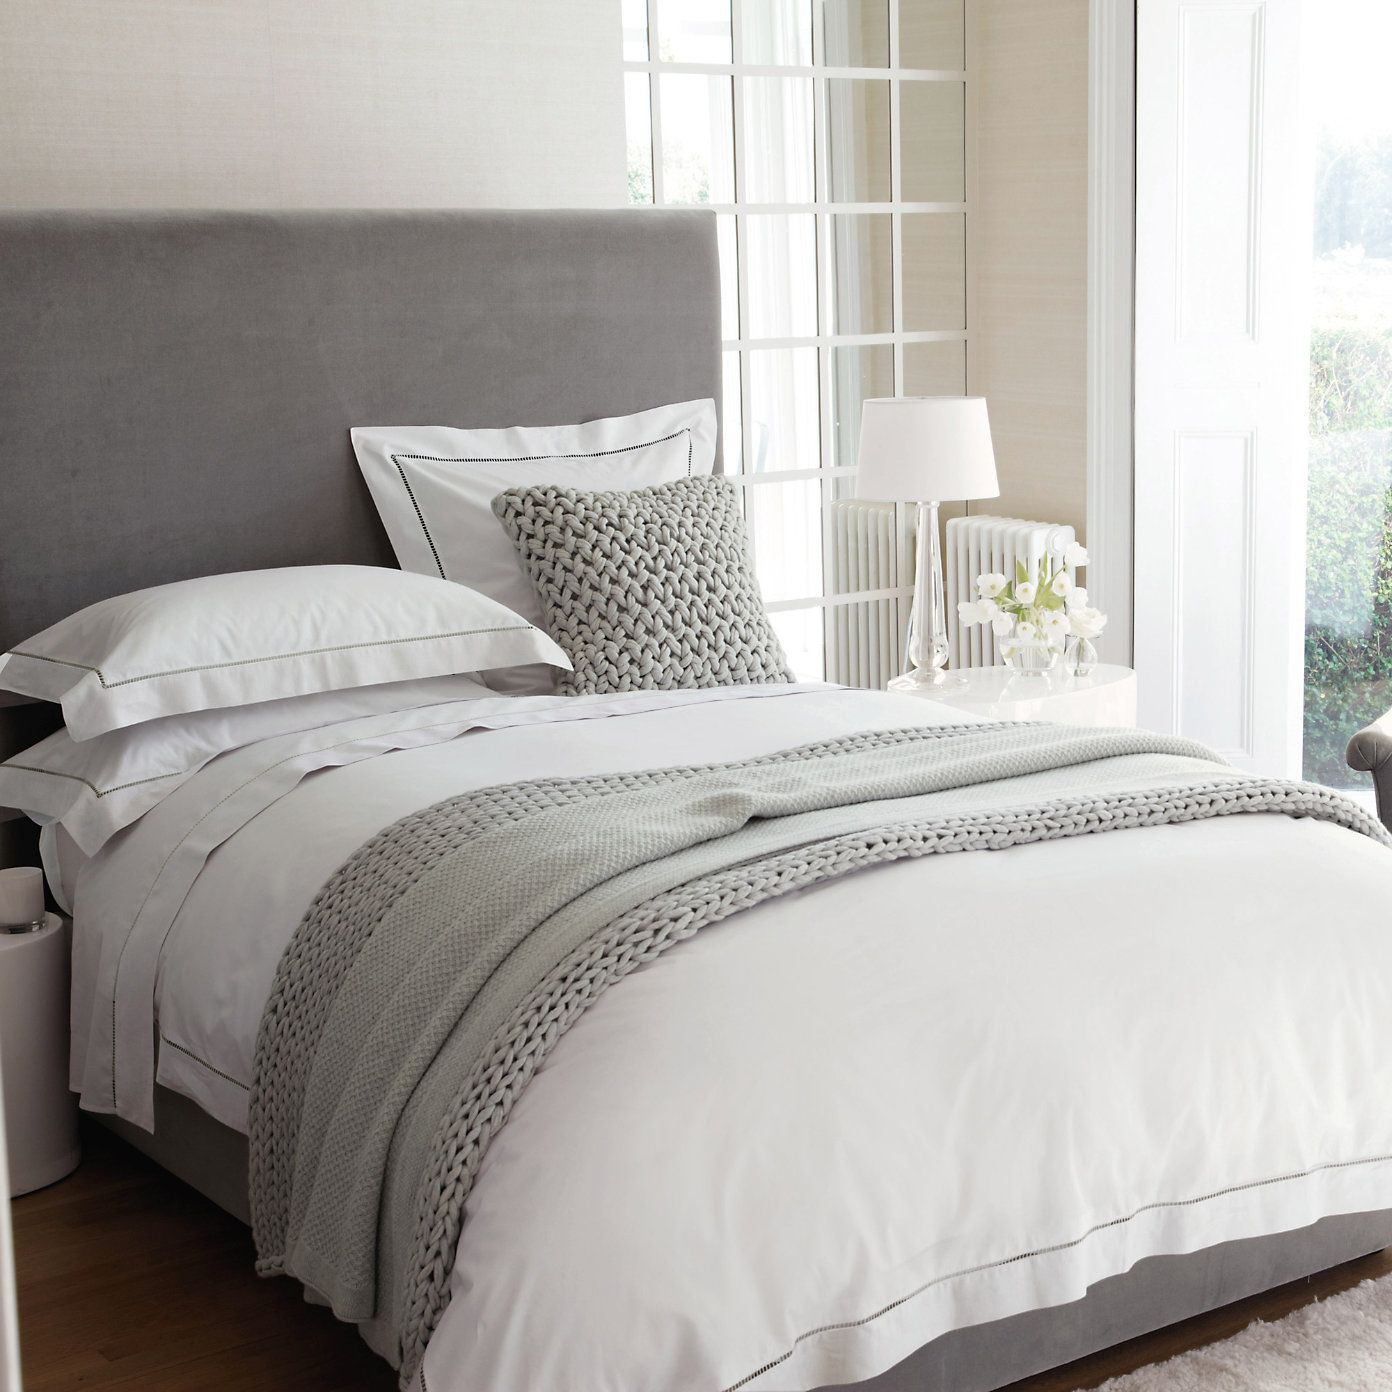 Master bedroom bed  Buy Bedroom ue Bed Linen ue Santorini Bed Linen Collection from The